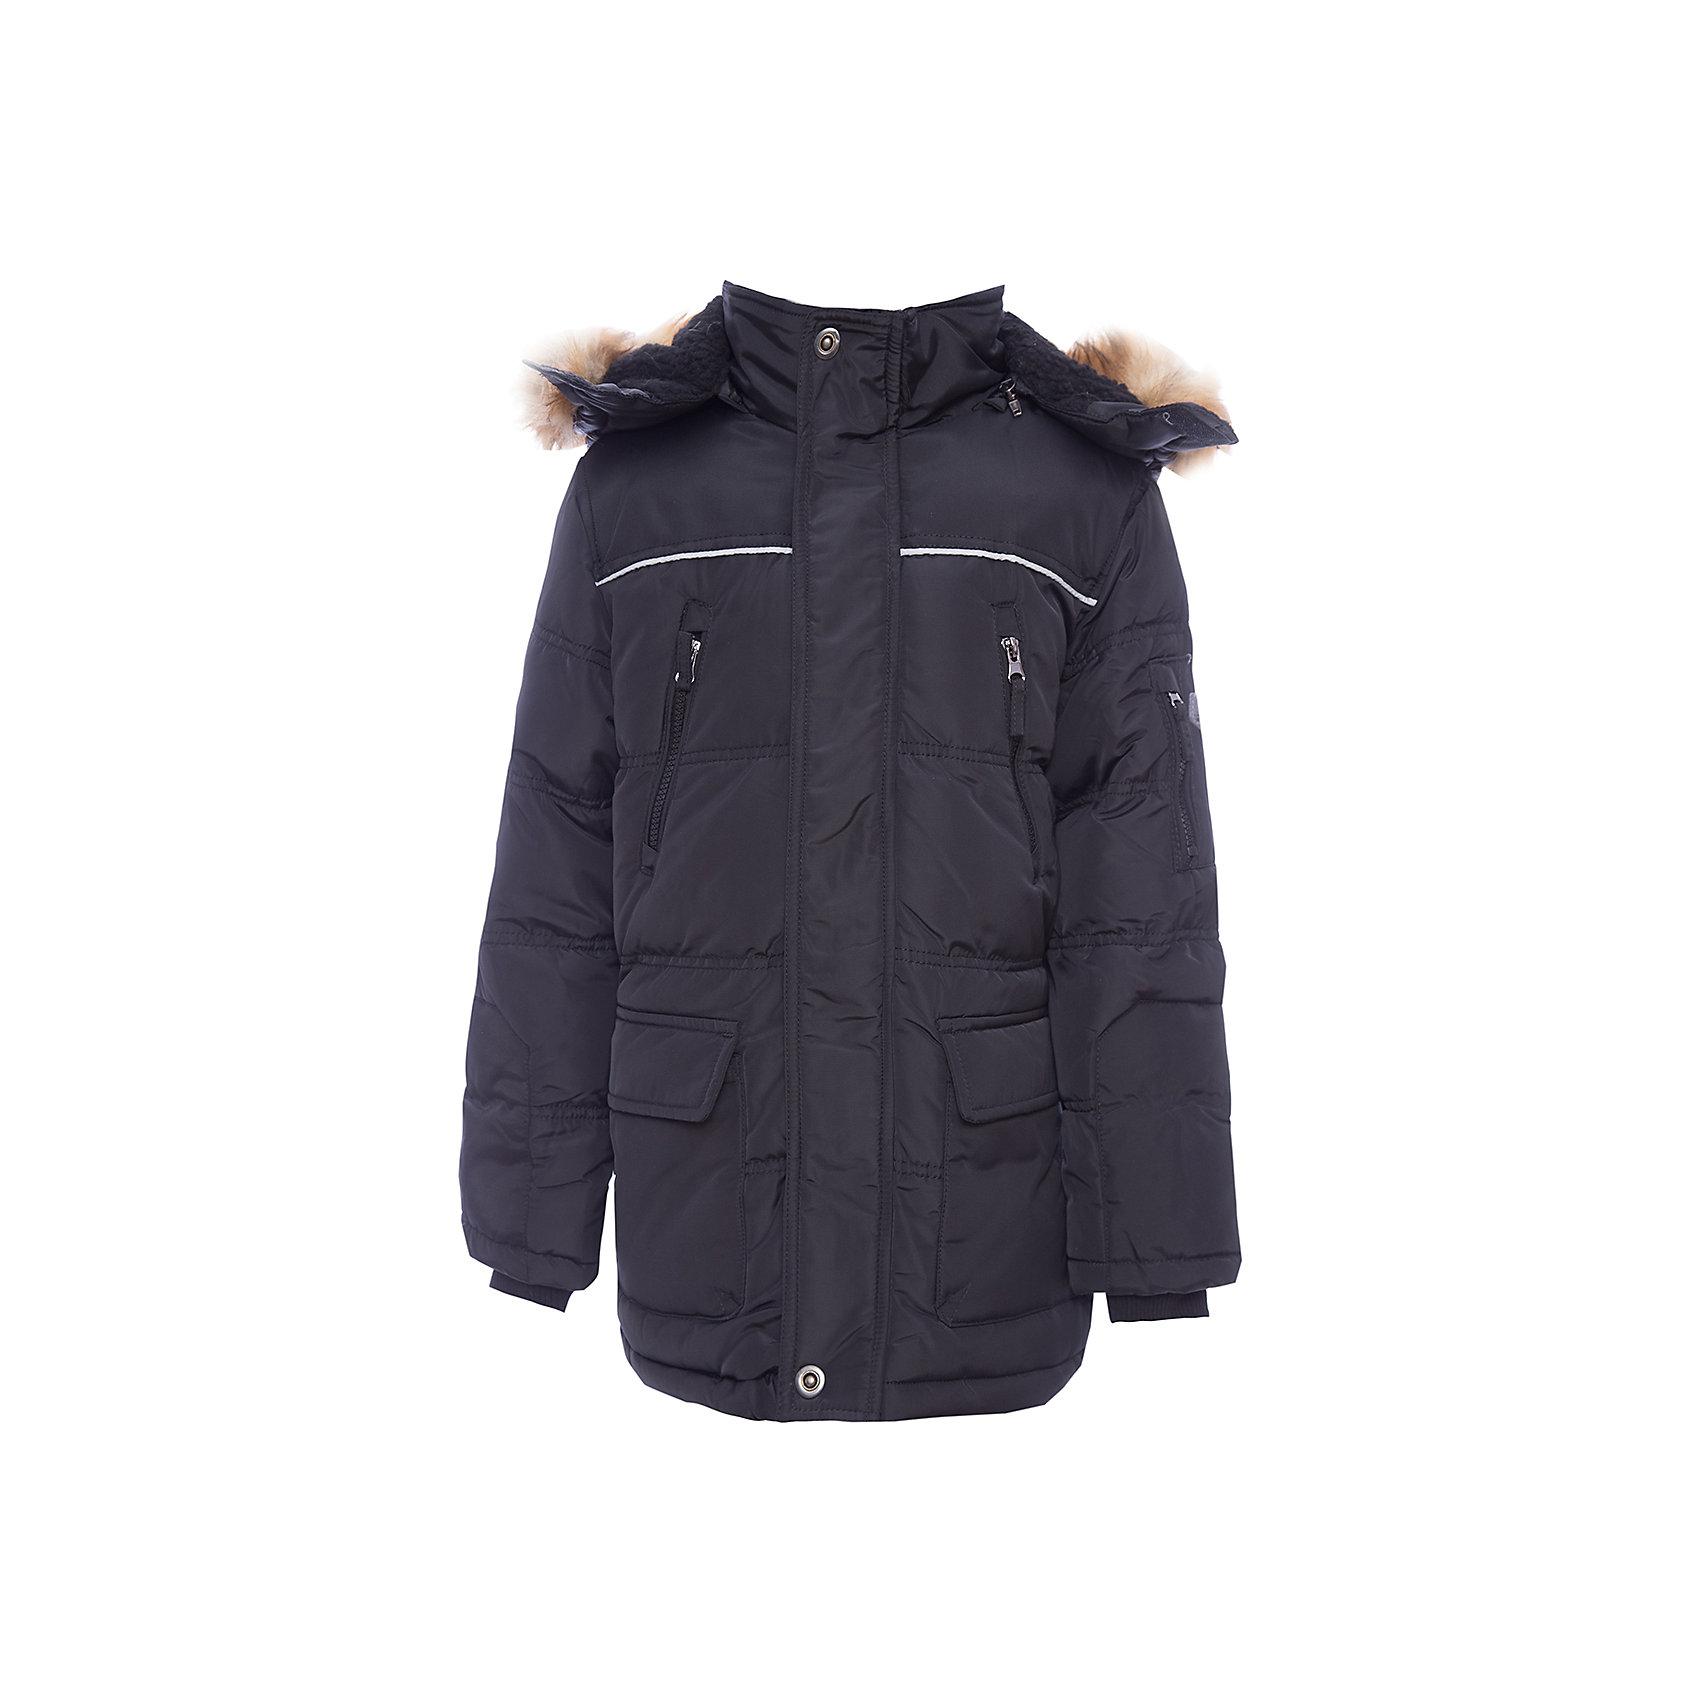 Куртка Luminoso для мальчикаВерхняя одежда<br>Куртка Luminoso для мальчика<br><br>Состав:<br>Верх: 100% полиэстер/100% нейлон Подкладка: 100% полиэстер Наполнитель 100% полиэстер<br><br>Ширина мм: 356<br>Глубина мм: 10<br>Высота мм: 245<br>Вес г: 519<br>Цвет: серый<br>Возраст от месяцев: 156<br>Возраст до месяцев: 168<br>Пол: Мужской<br>Возраст: Детский<br>Размер: 164,134,140,146,152,158<br>SKU: 7096886